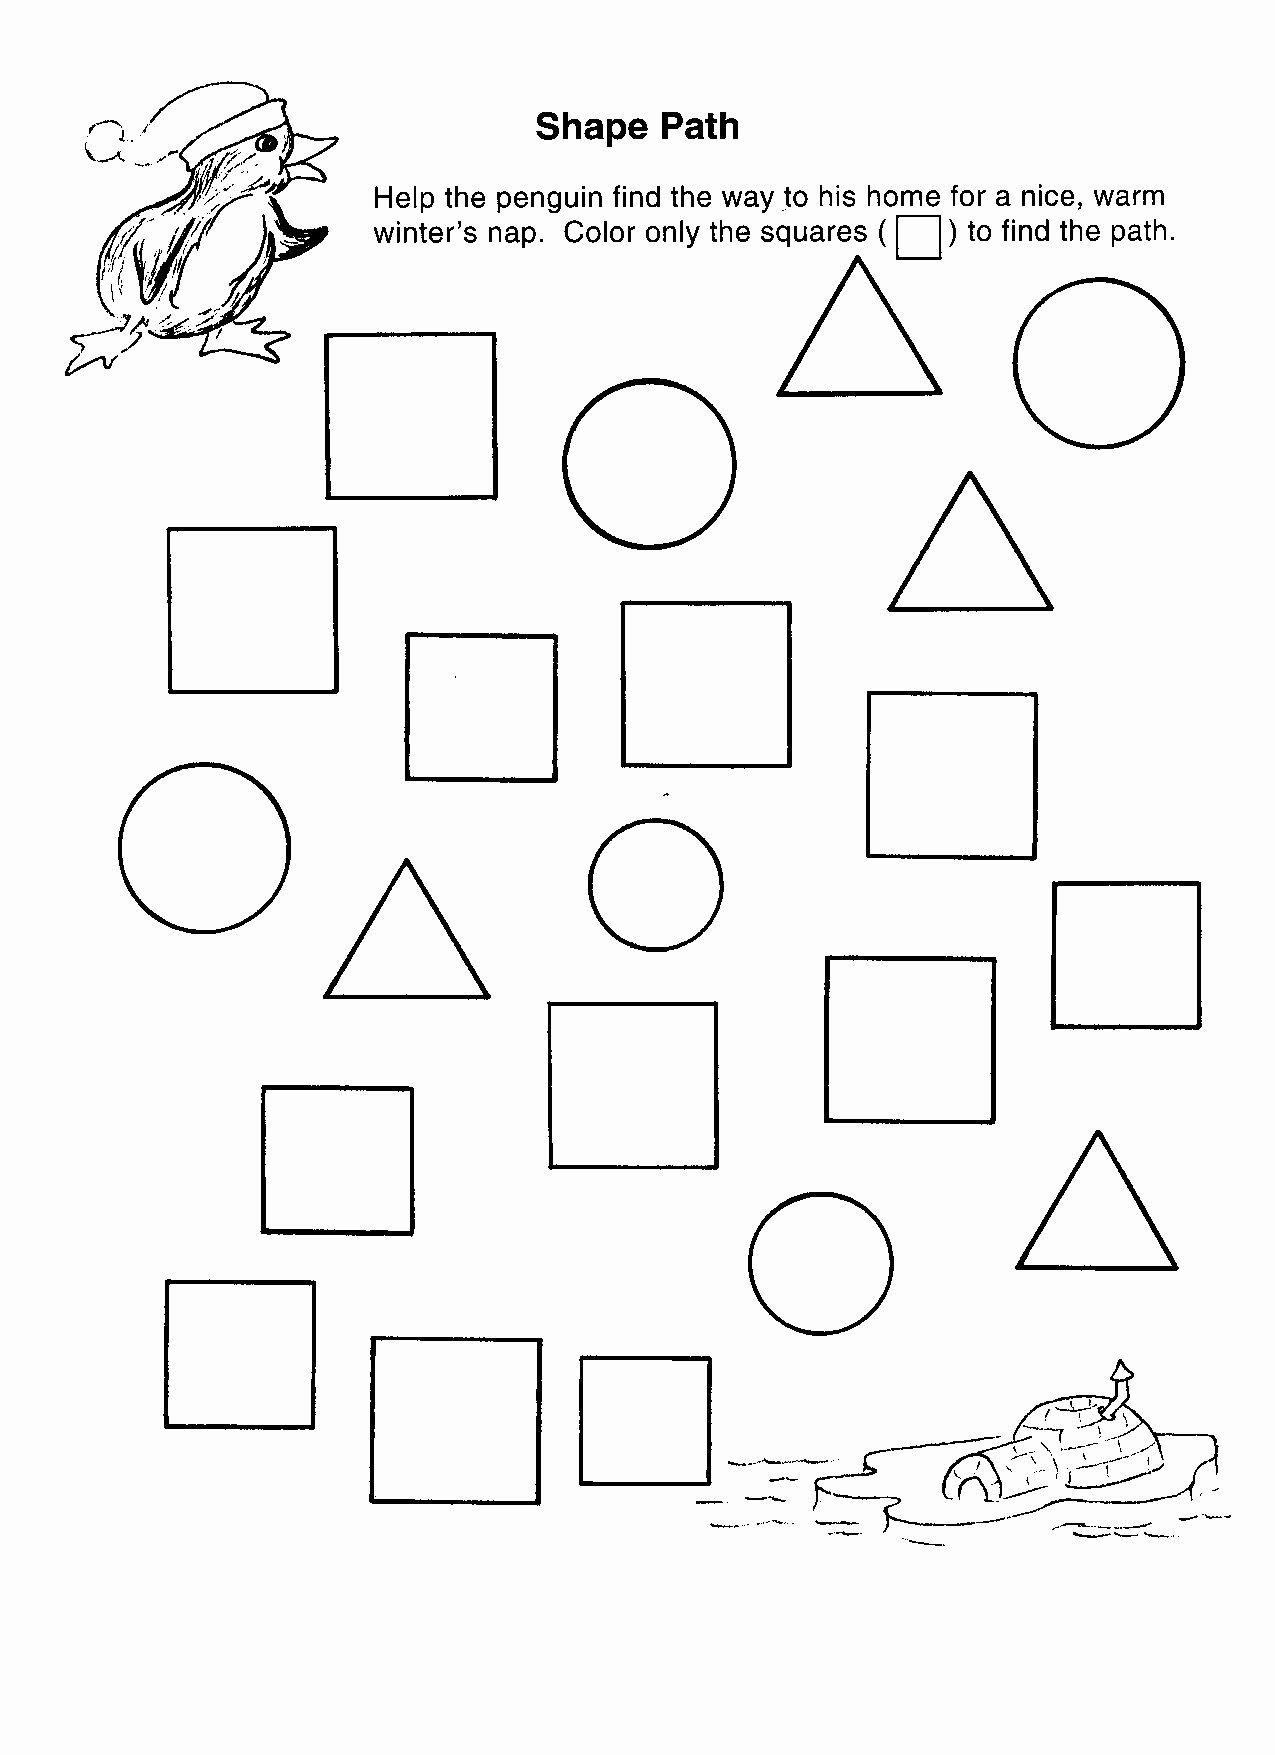 Shape Recognition Worksheets for Preschoolers Lovely Shape Recognition